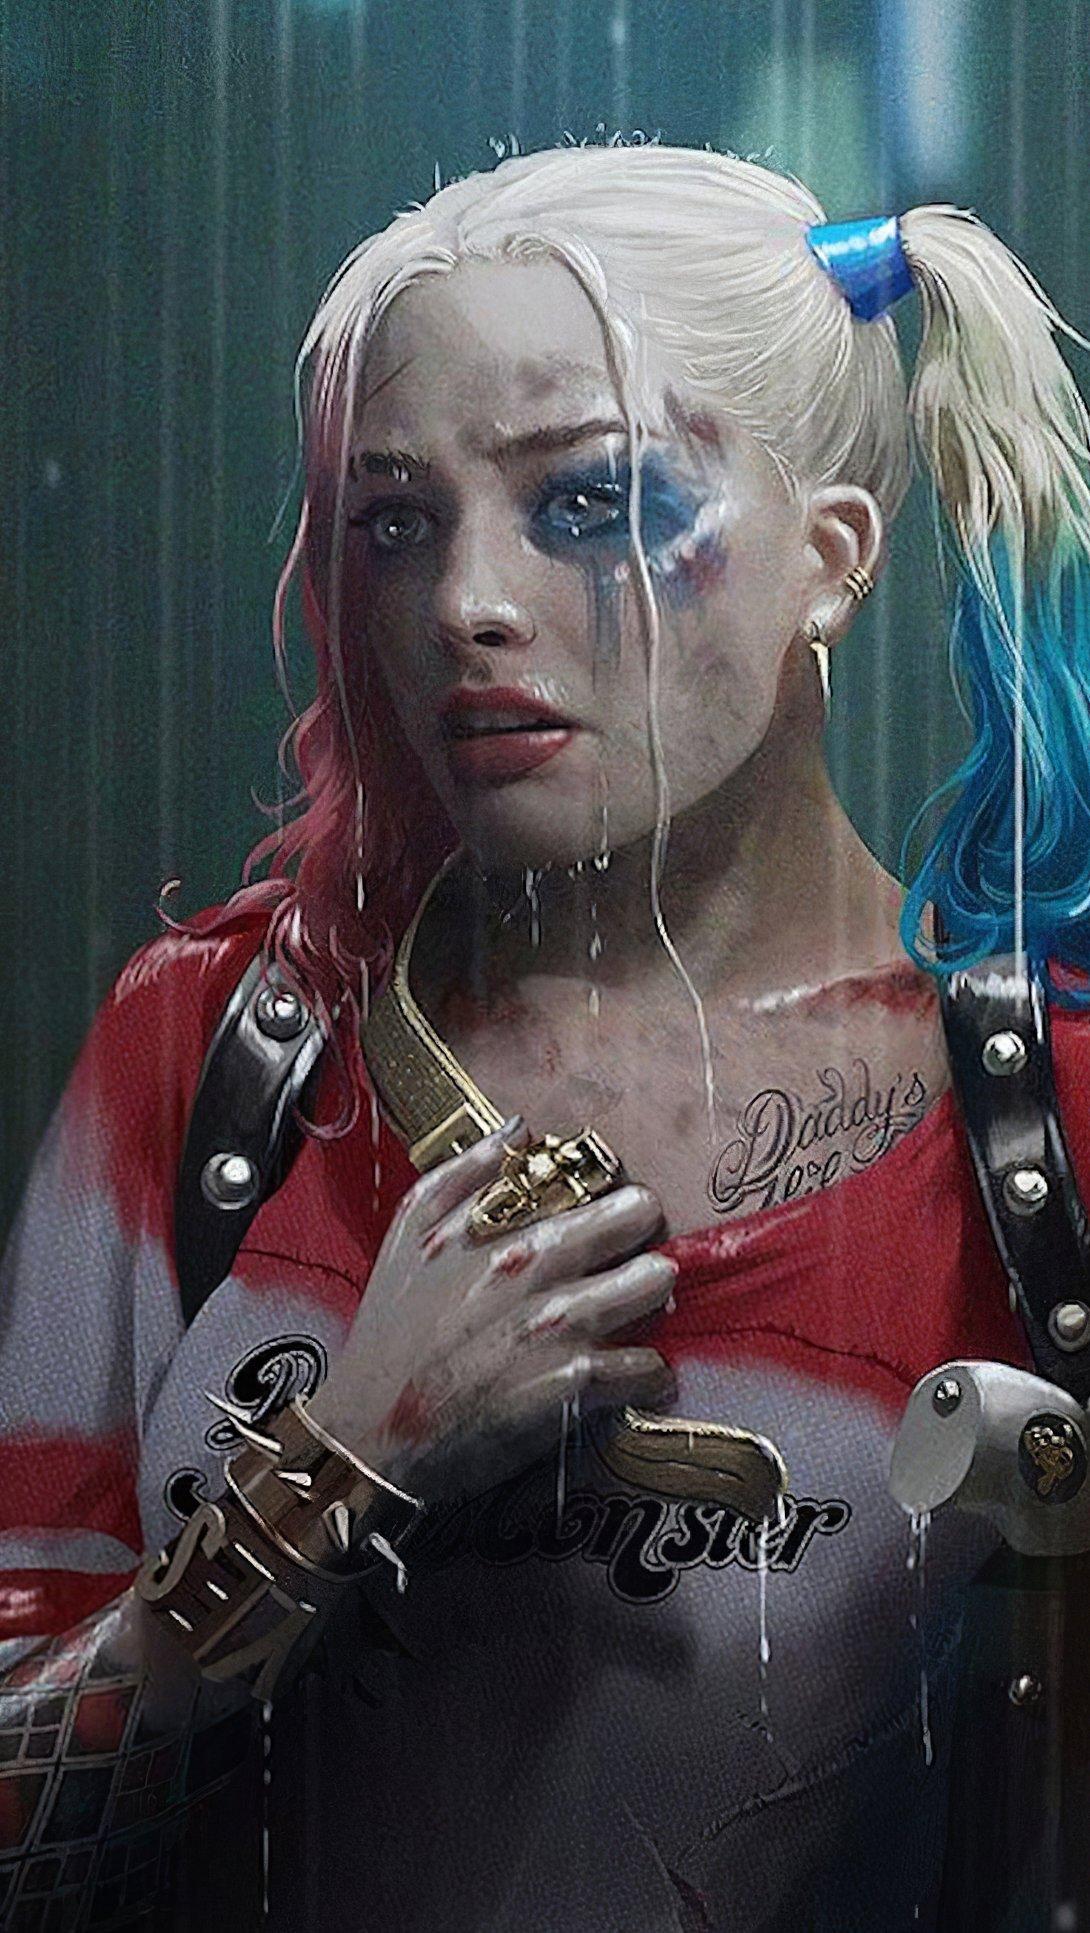 Wallpaper Harley Quinn in the rain Vertical